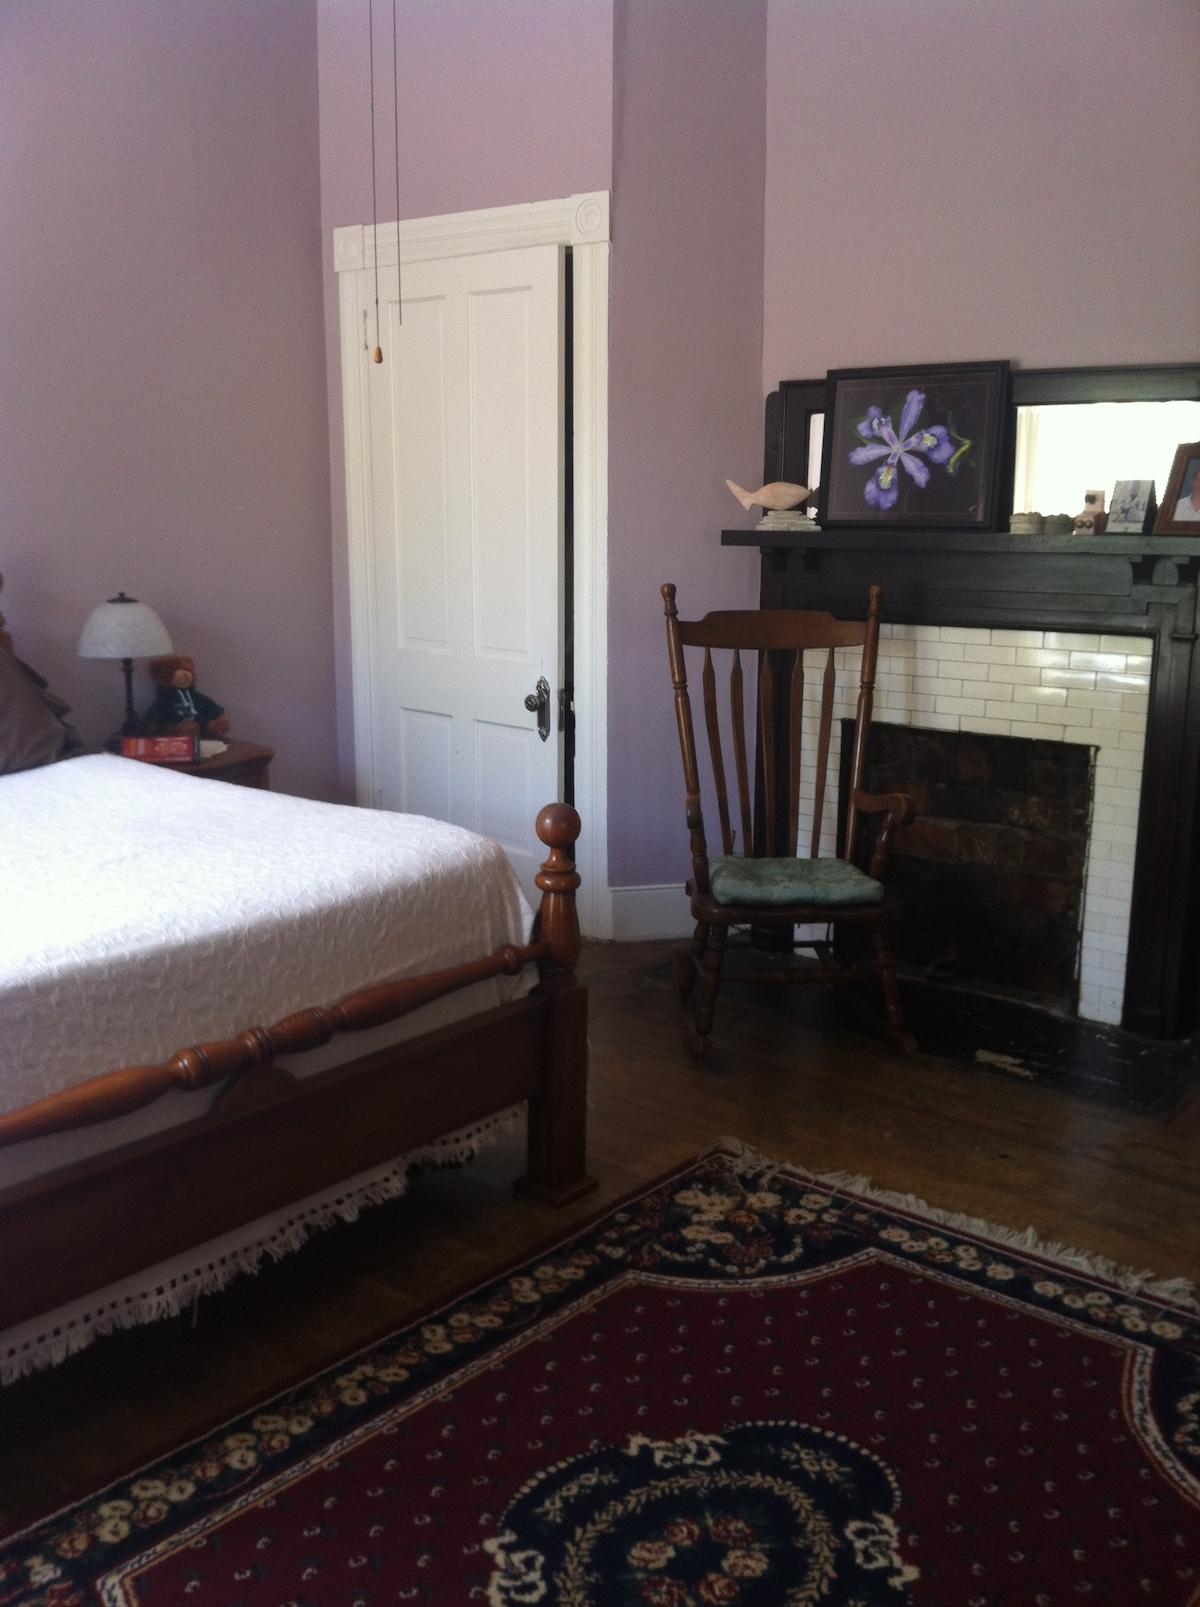 Historic Old Louisville - Room B